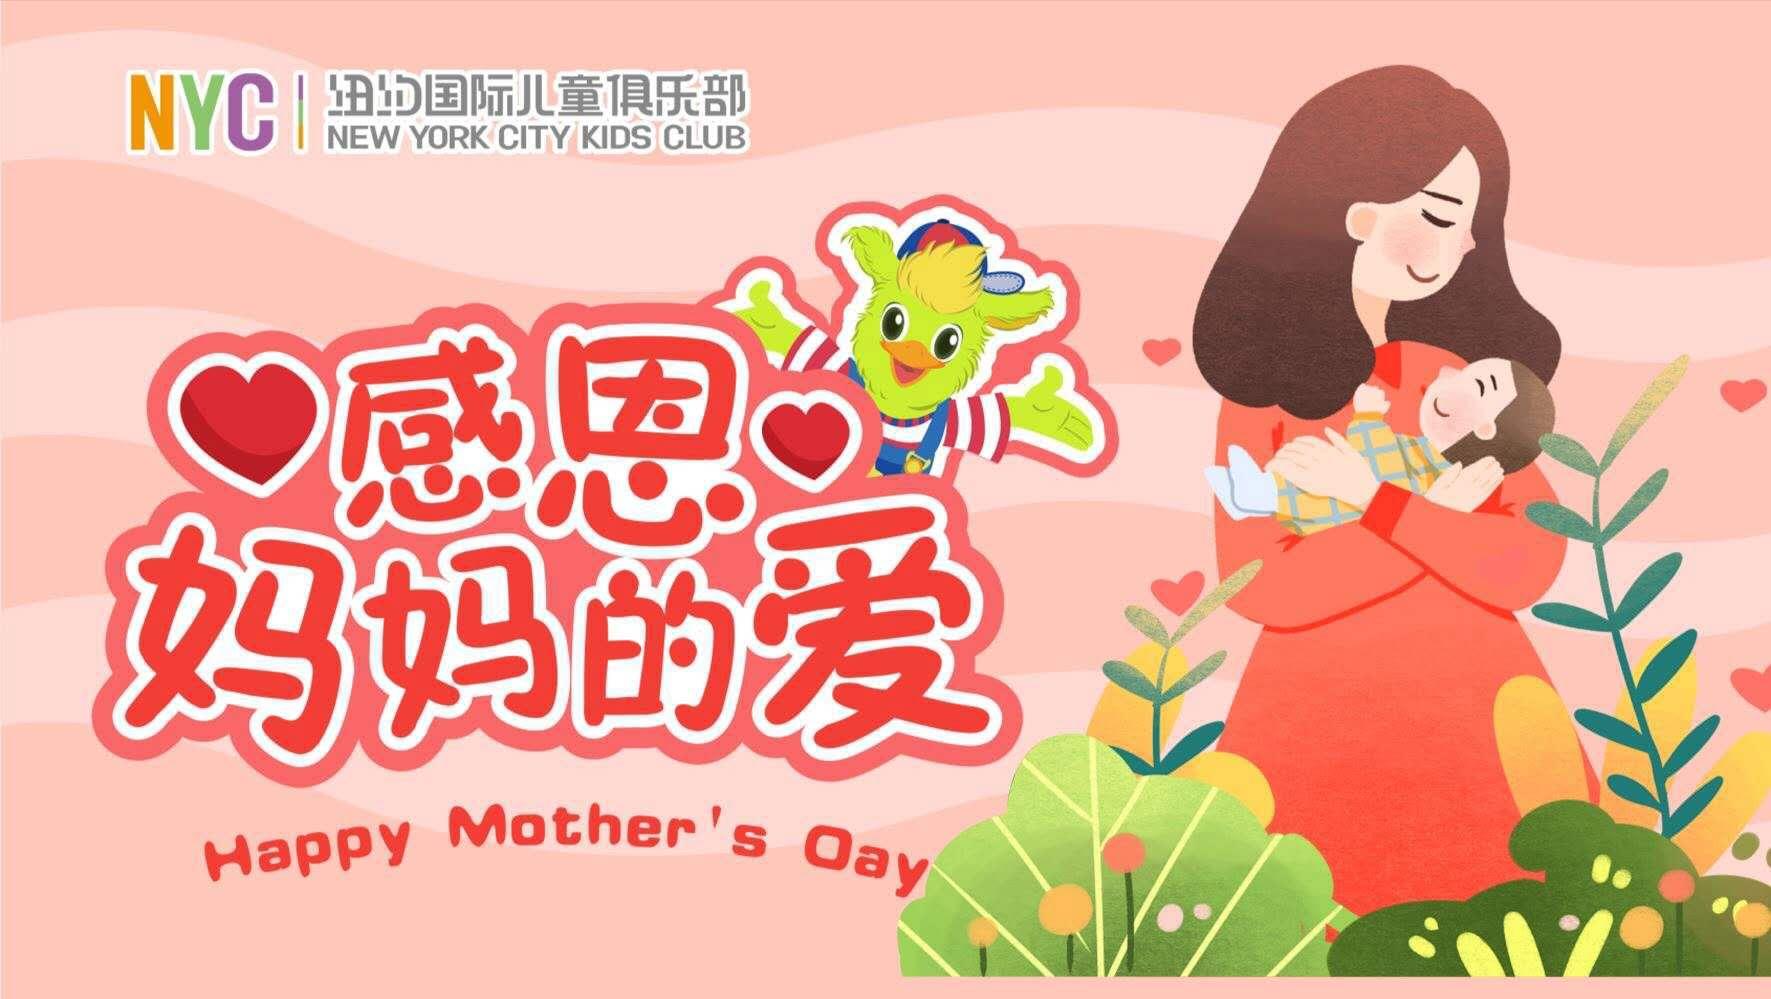 NYC纽约国际北京西小口早教中心:【5月活动预告】暮春醉五月,Pongo等你约